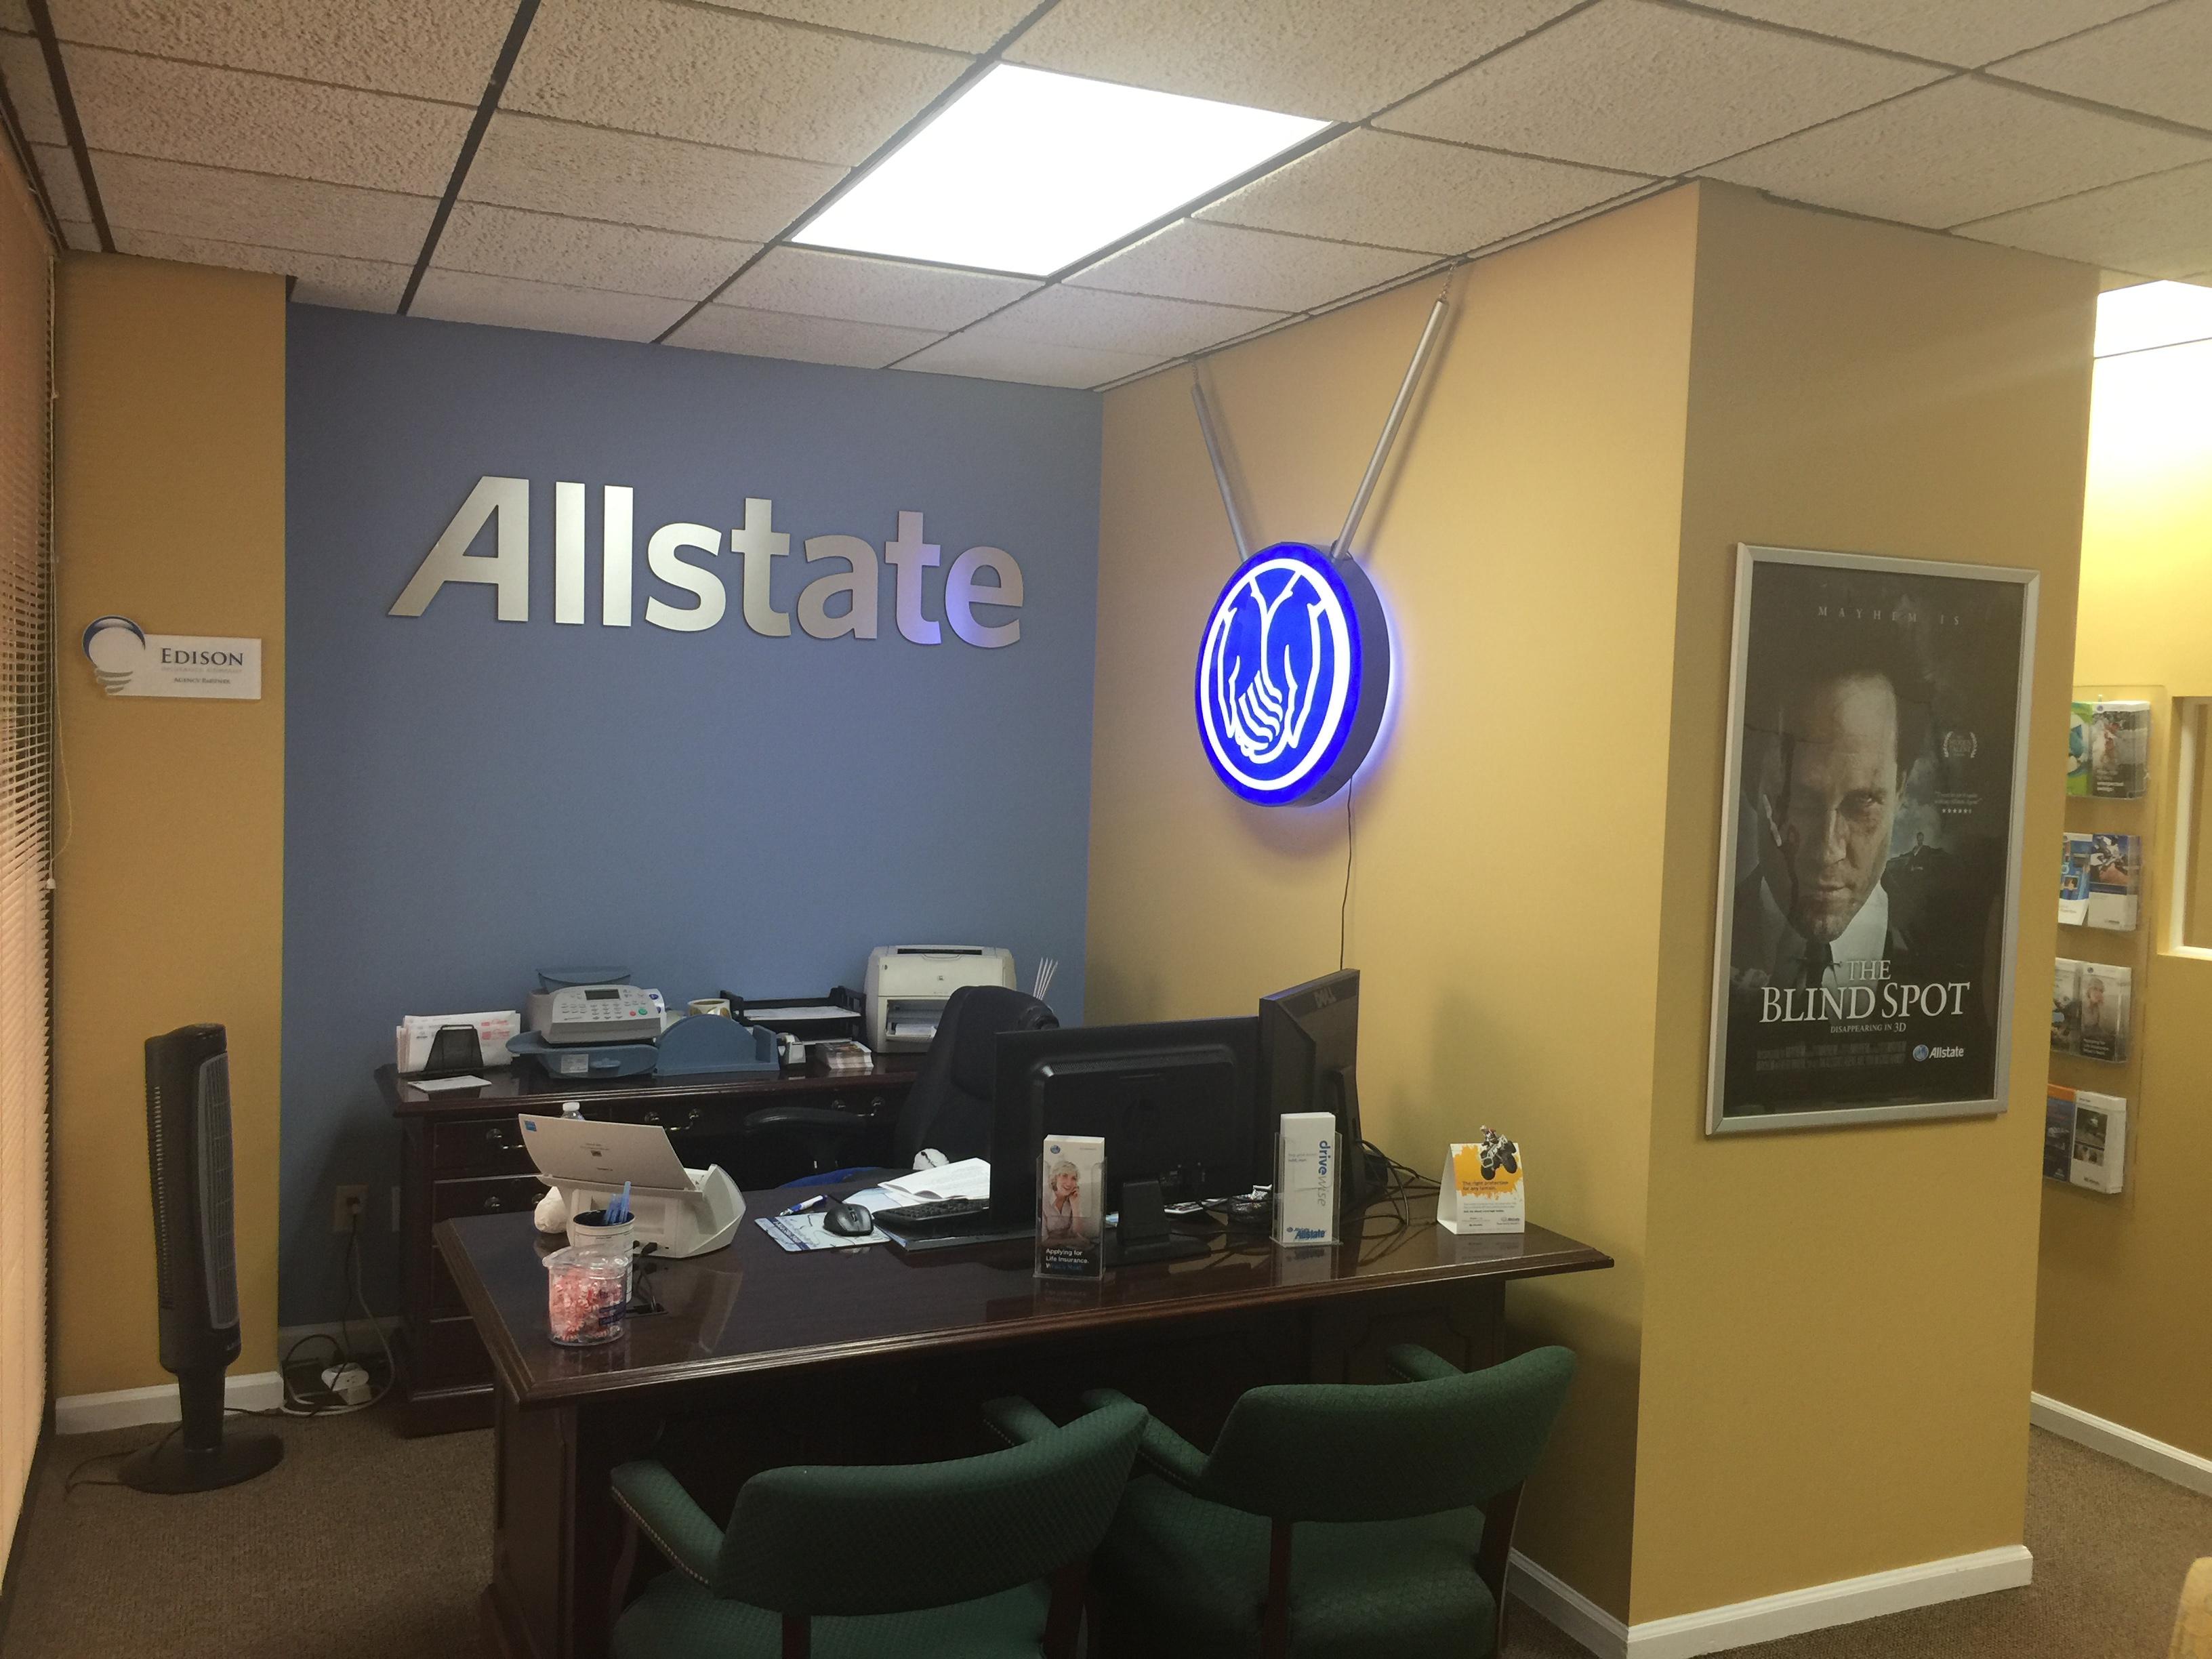 Nicholas DeRosa: Allstate Insurance image 1